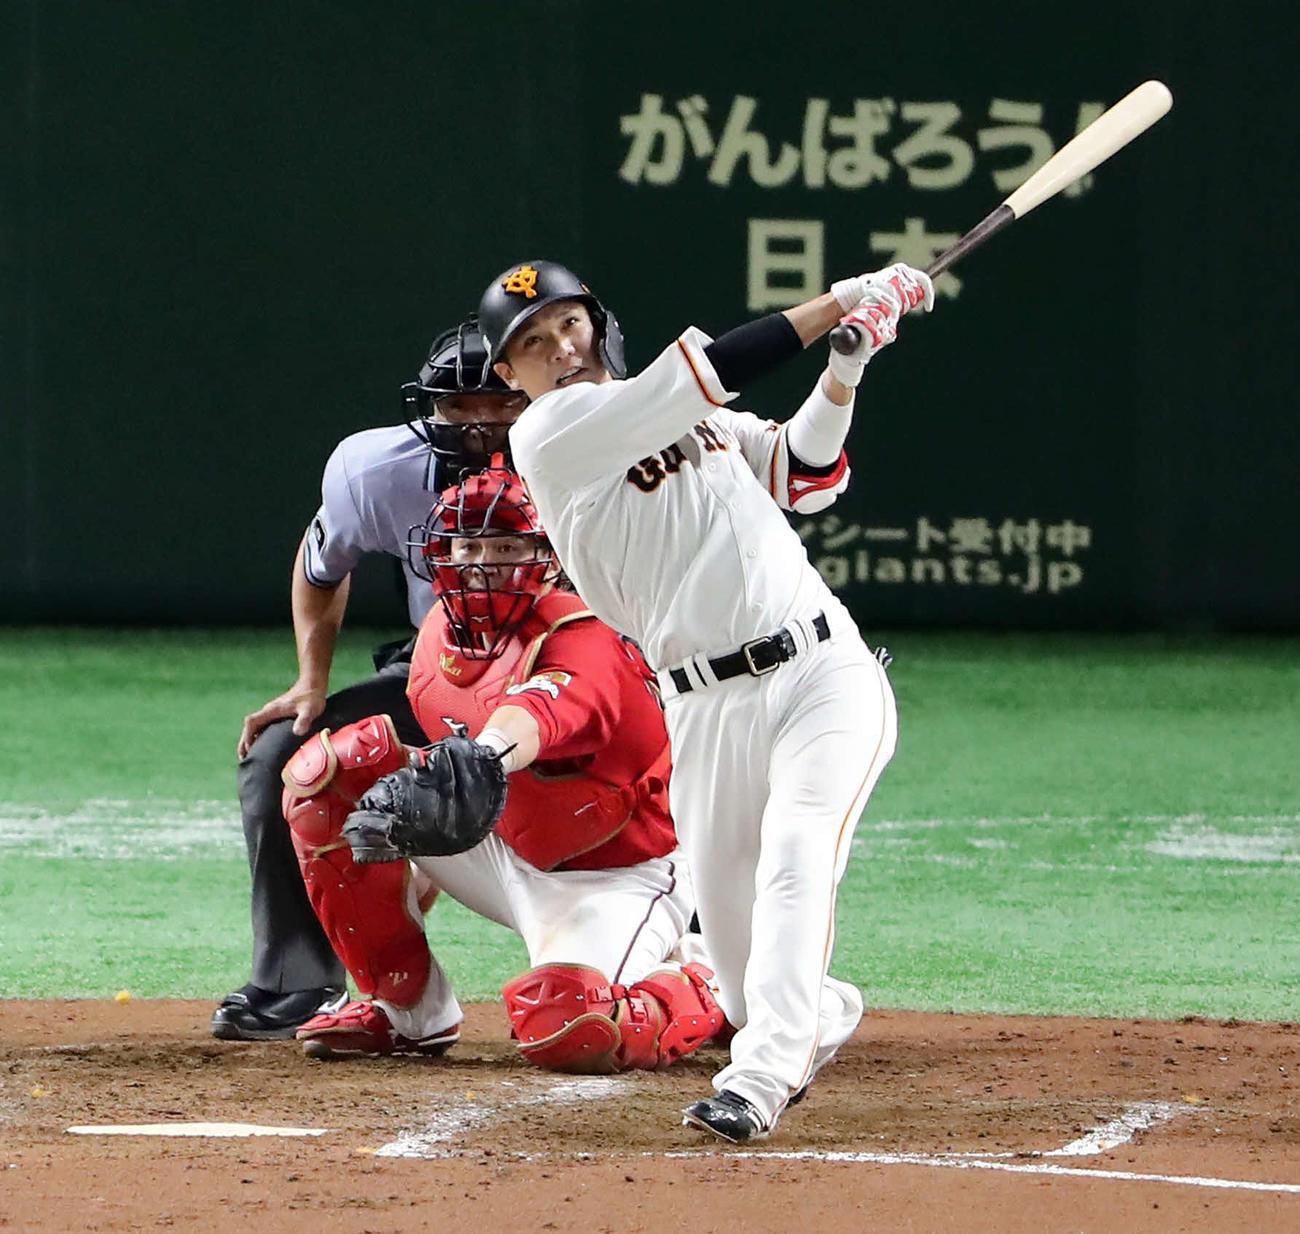 逆転2点本塁打を放つ坂本勇人(2019年8月28日撮影)